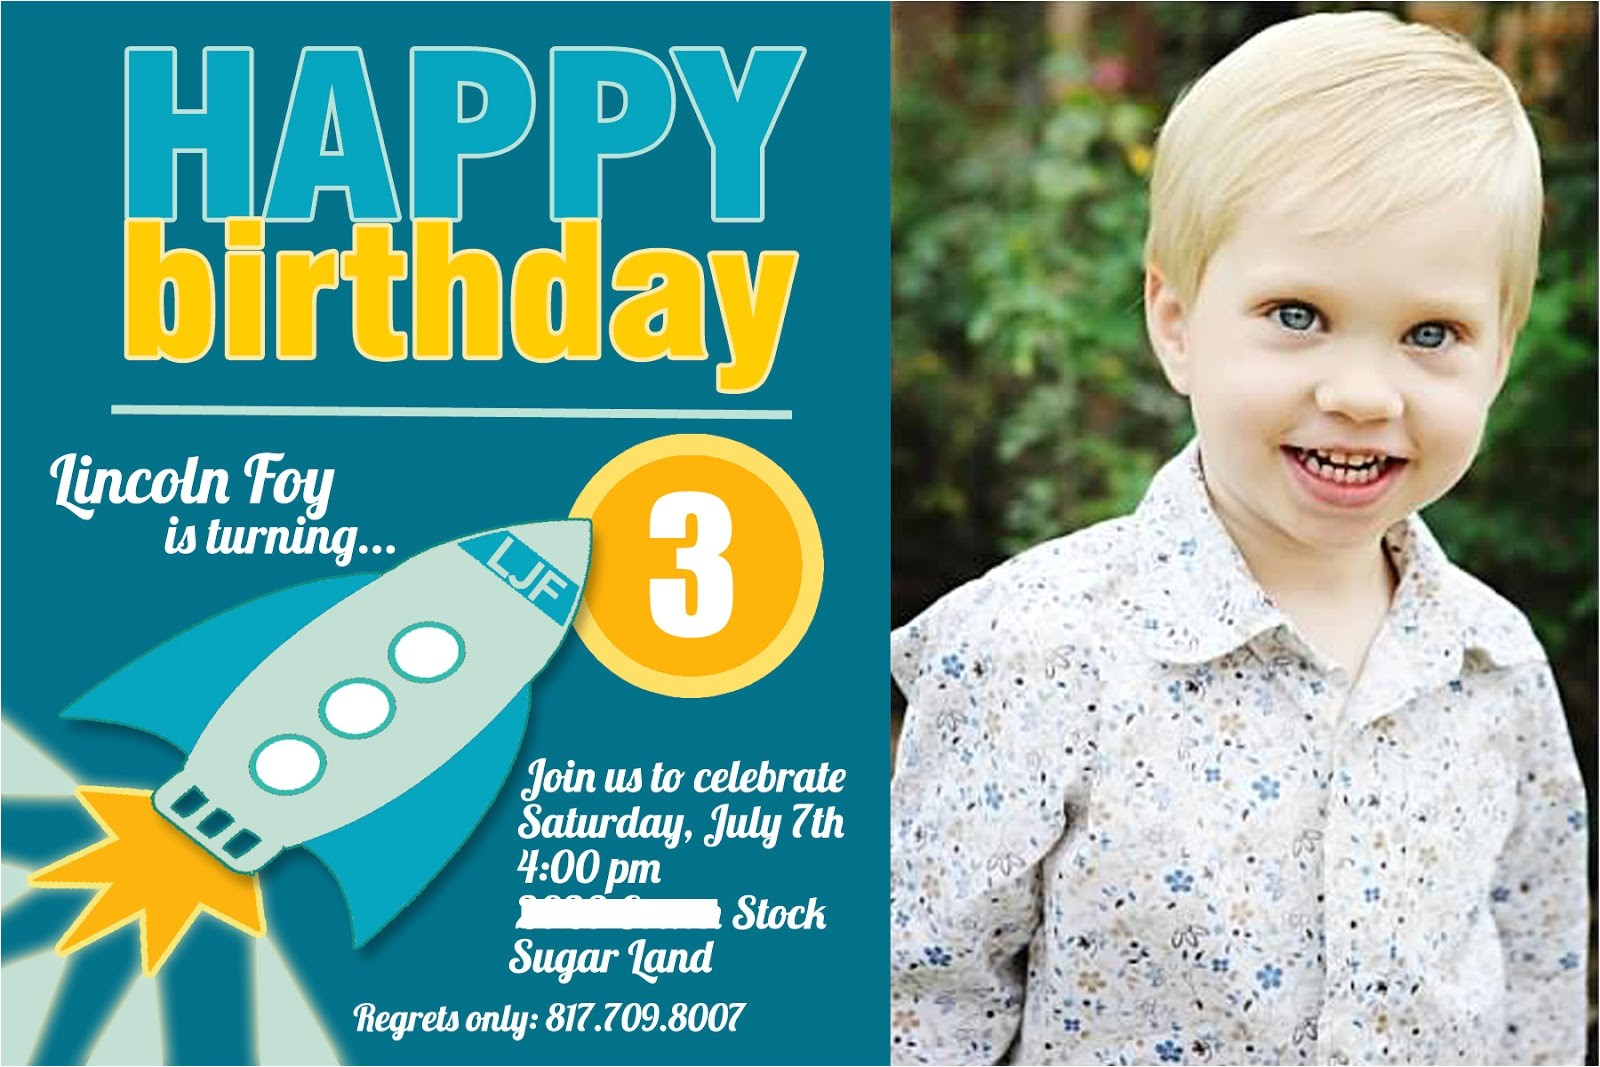 3 years old birthday invitations wording